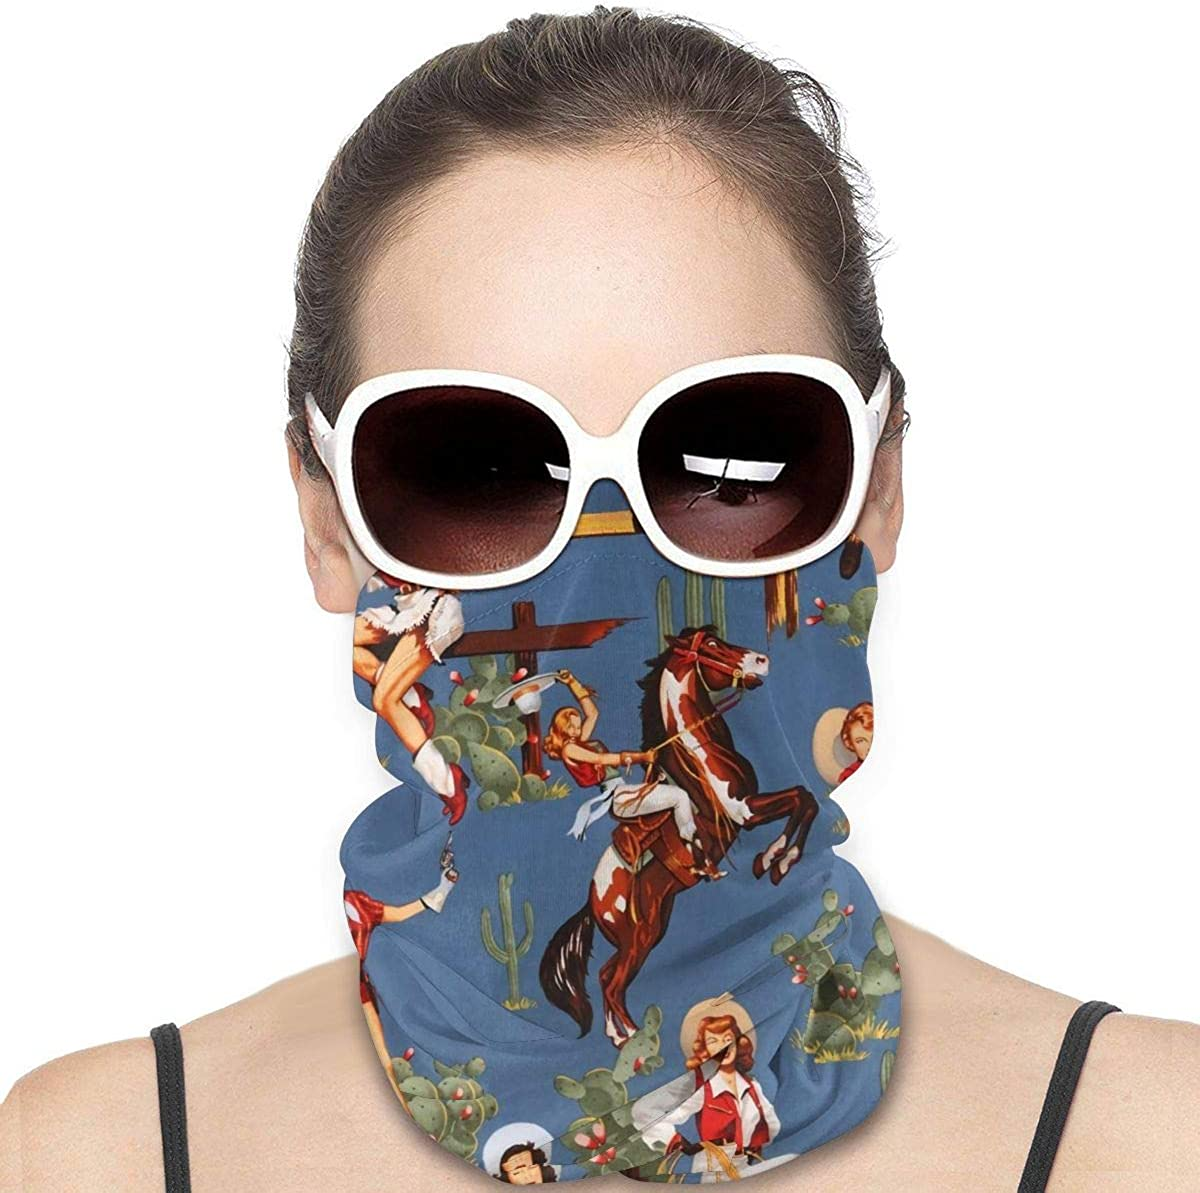 JinSPef Neck Gaiters for Men - Sexy Lady Cowgirl Western Girl Motorcycle Mask Ski Mask Face Scarf Head Bands Neck Warmer Men Headband Neck Gaiter